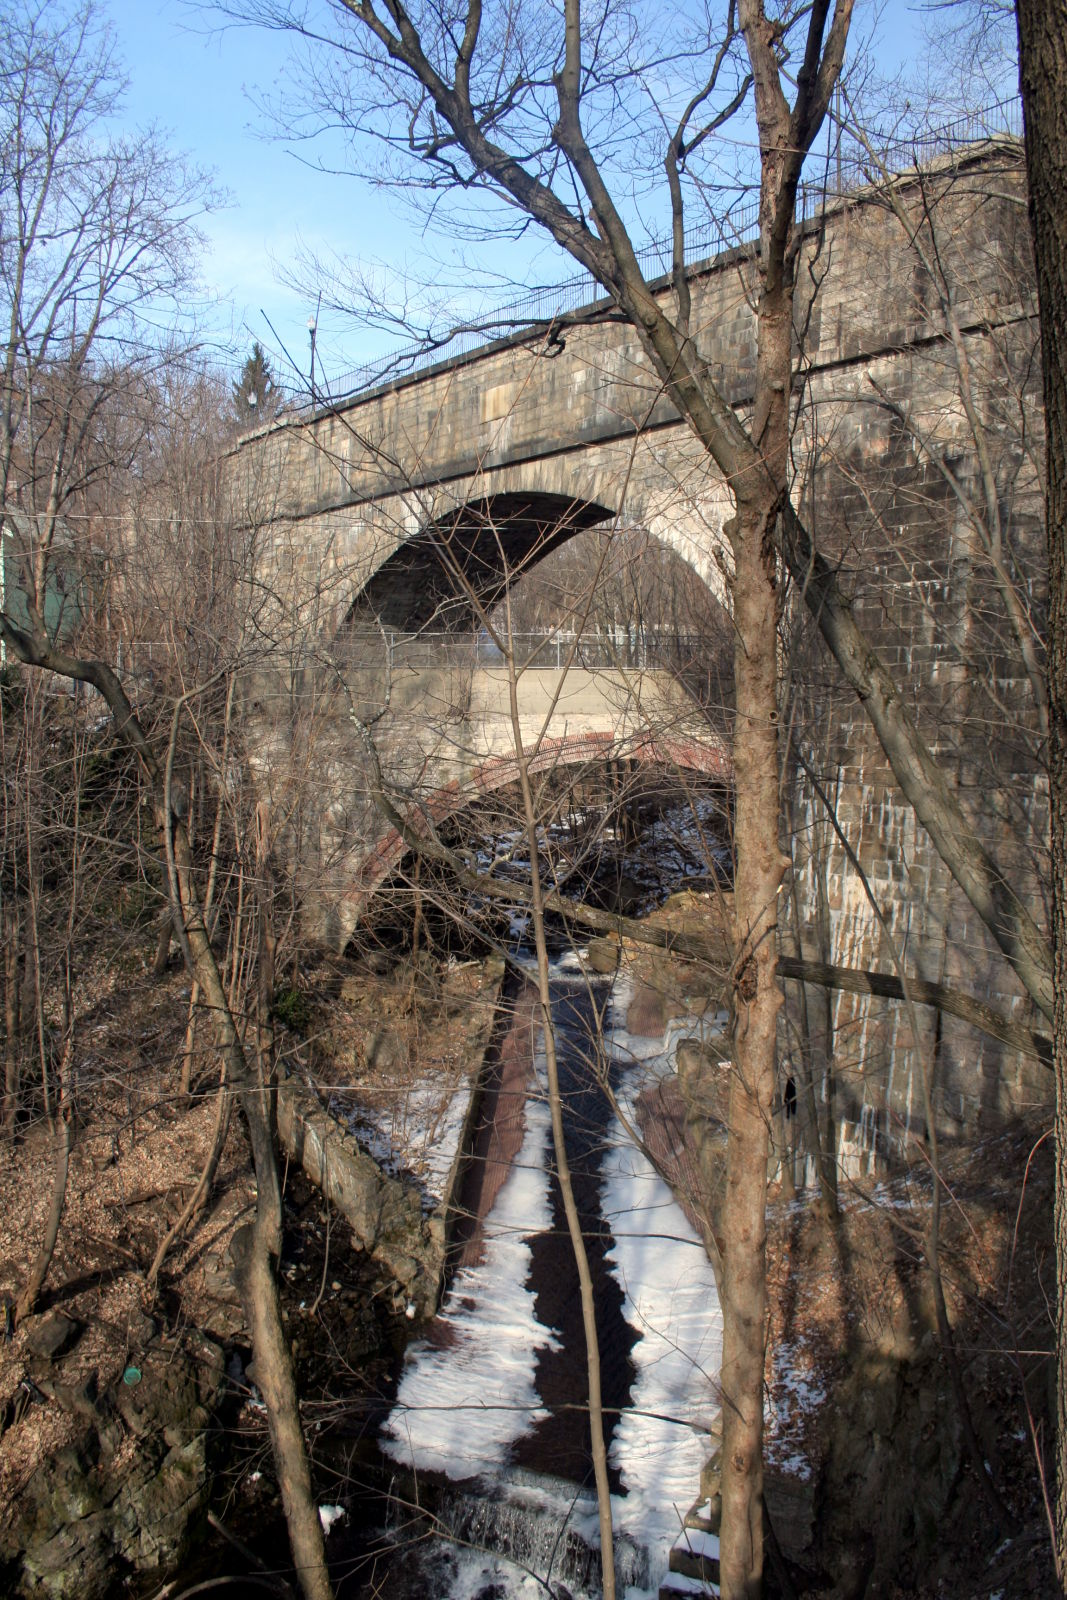 Aqueduct Bridge, Ossining NY. Photo from Bridgehunter.com